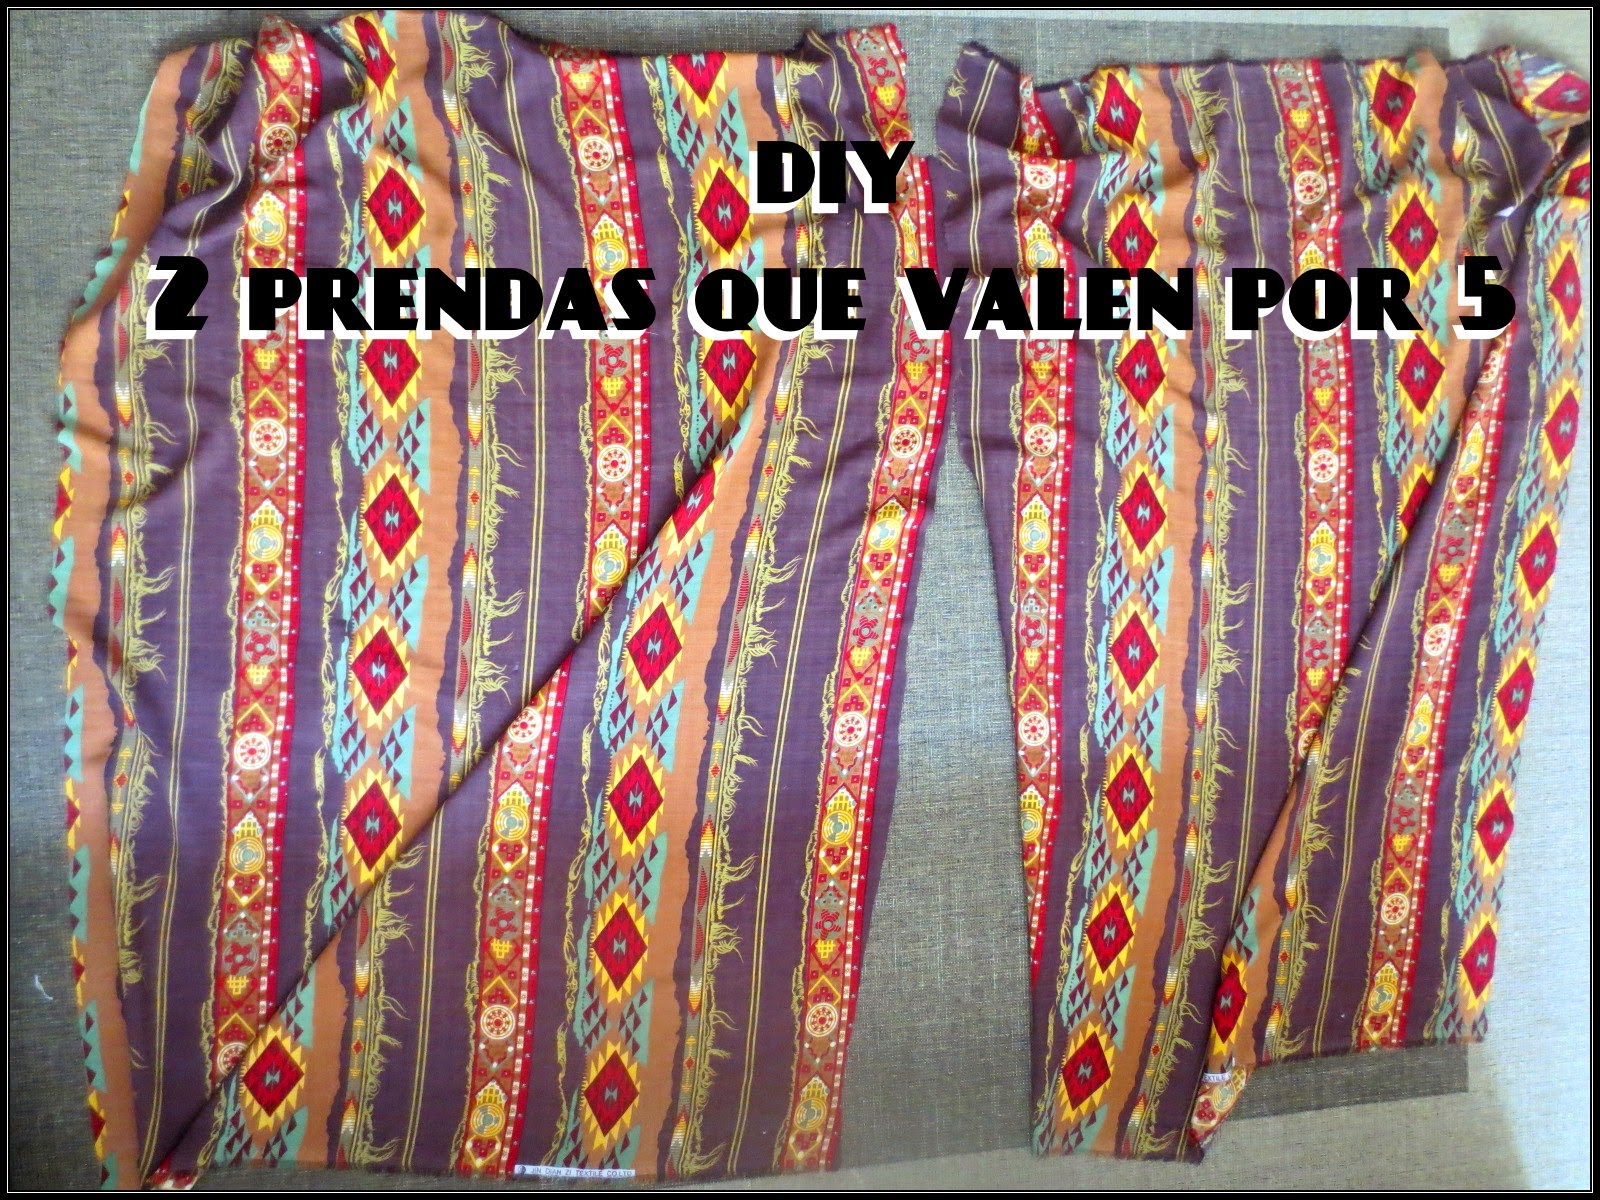 http://laportamagica.blogspot.com.es/2014/05/diy-2-prendas-que-valen-por-5.html